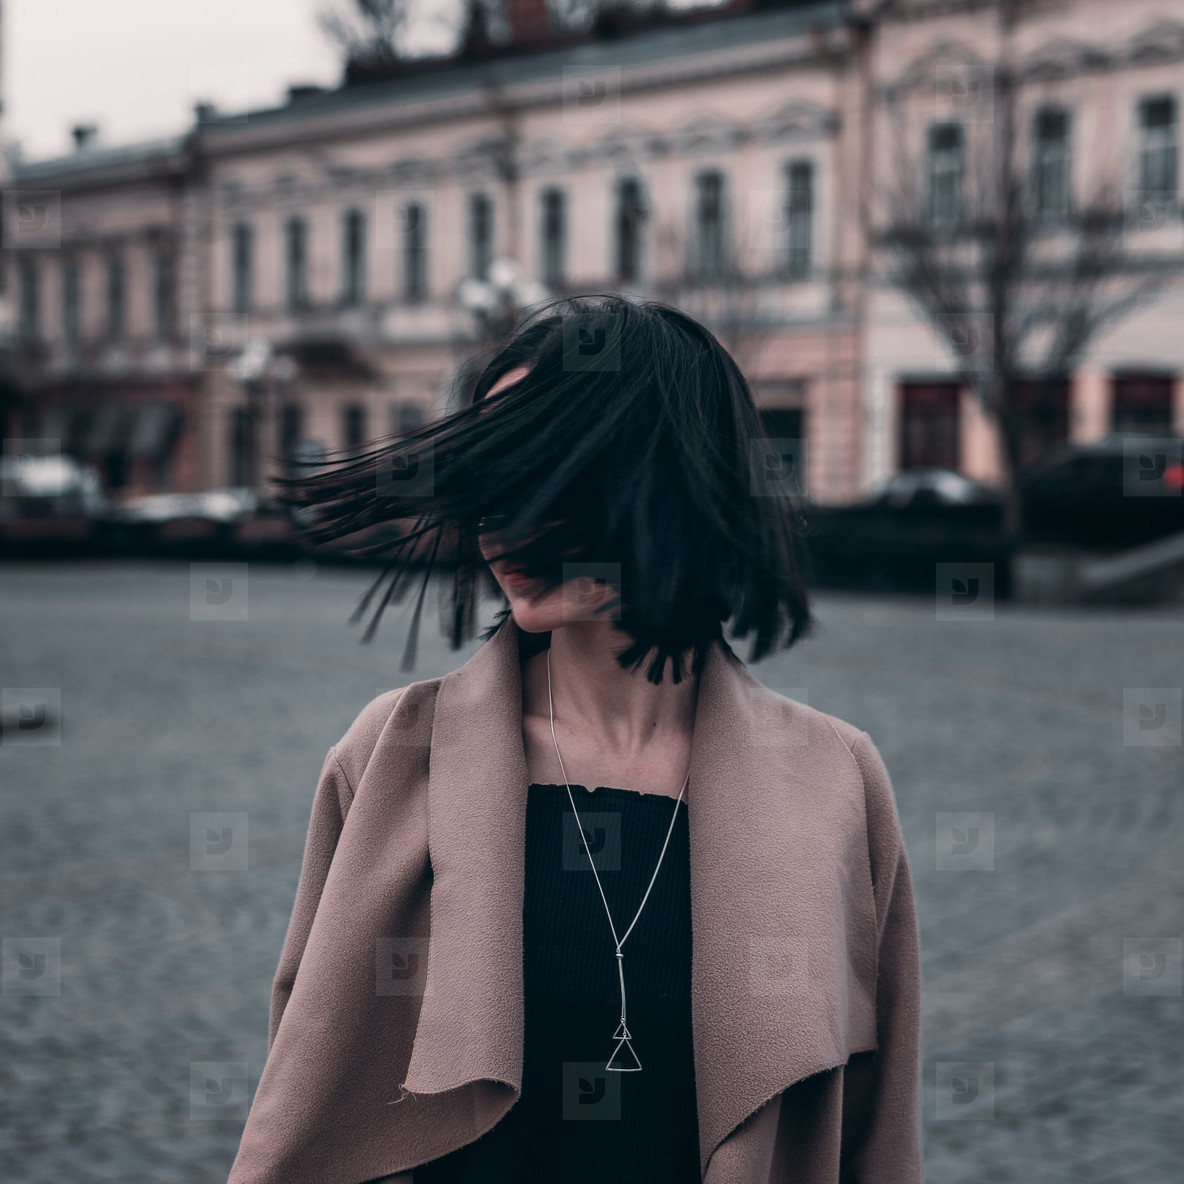 cute brunette in a coat walks around the city